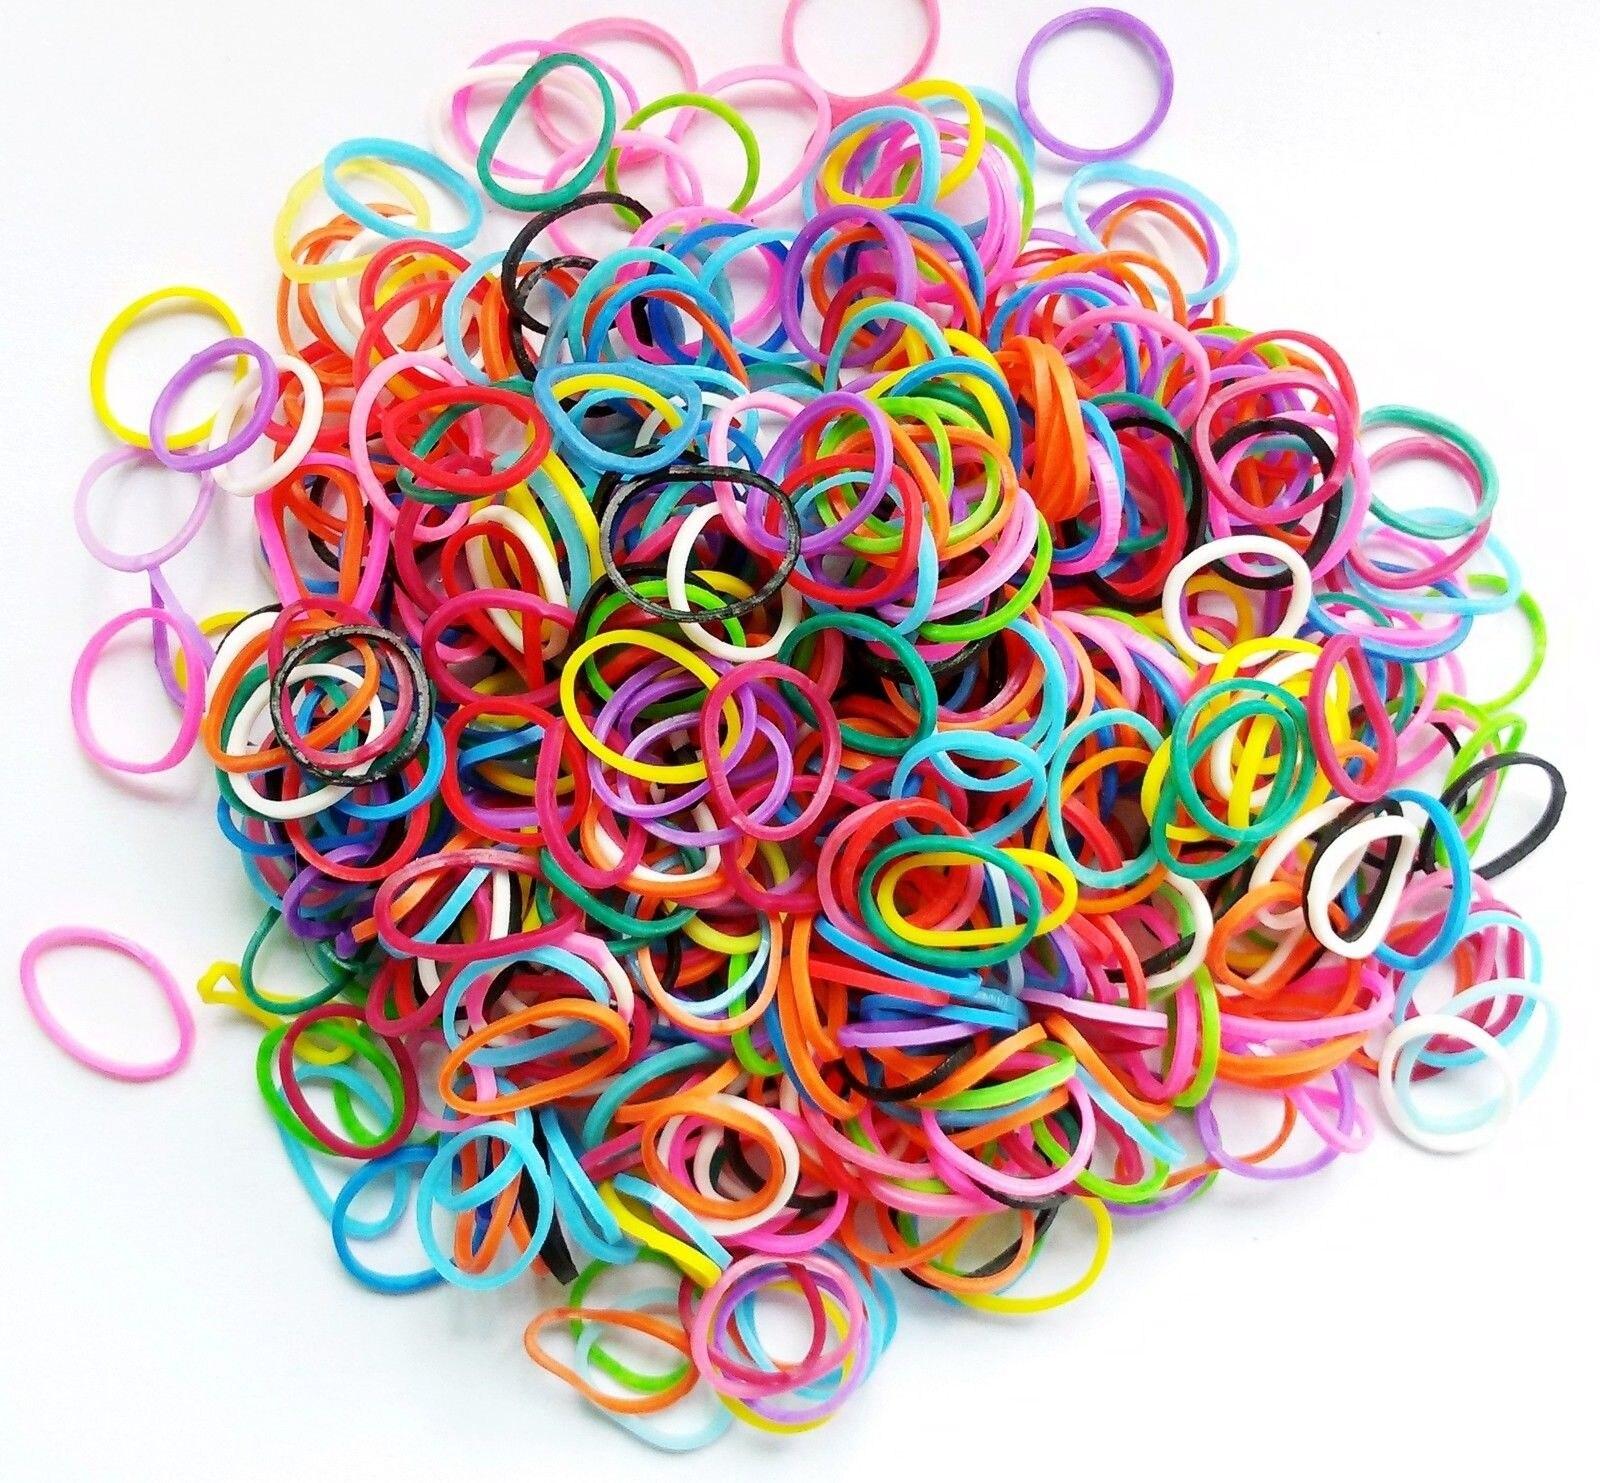 100pcs bag Mixed Colorful Rubber Bands Girls font b Pet b font Dog DIY Hair Bows